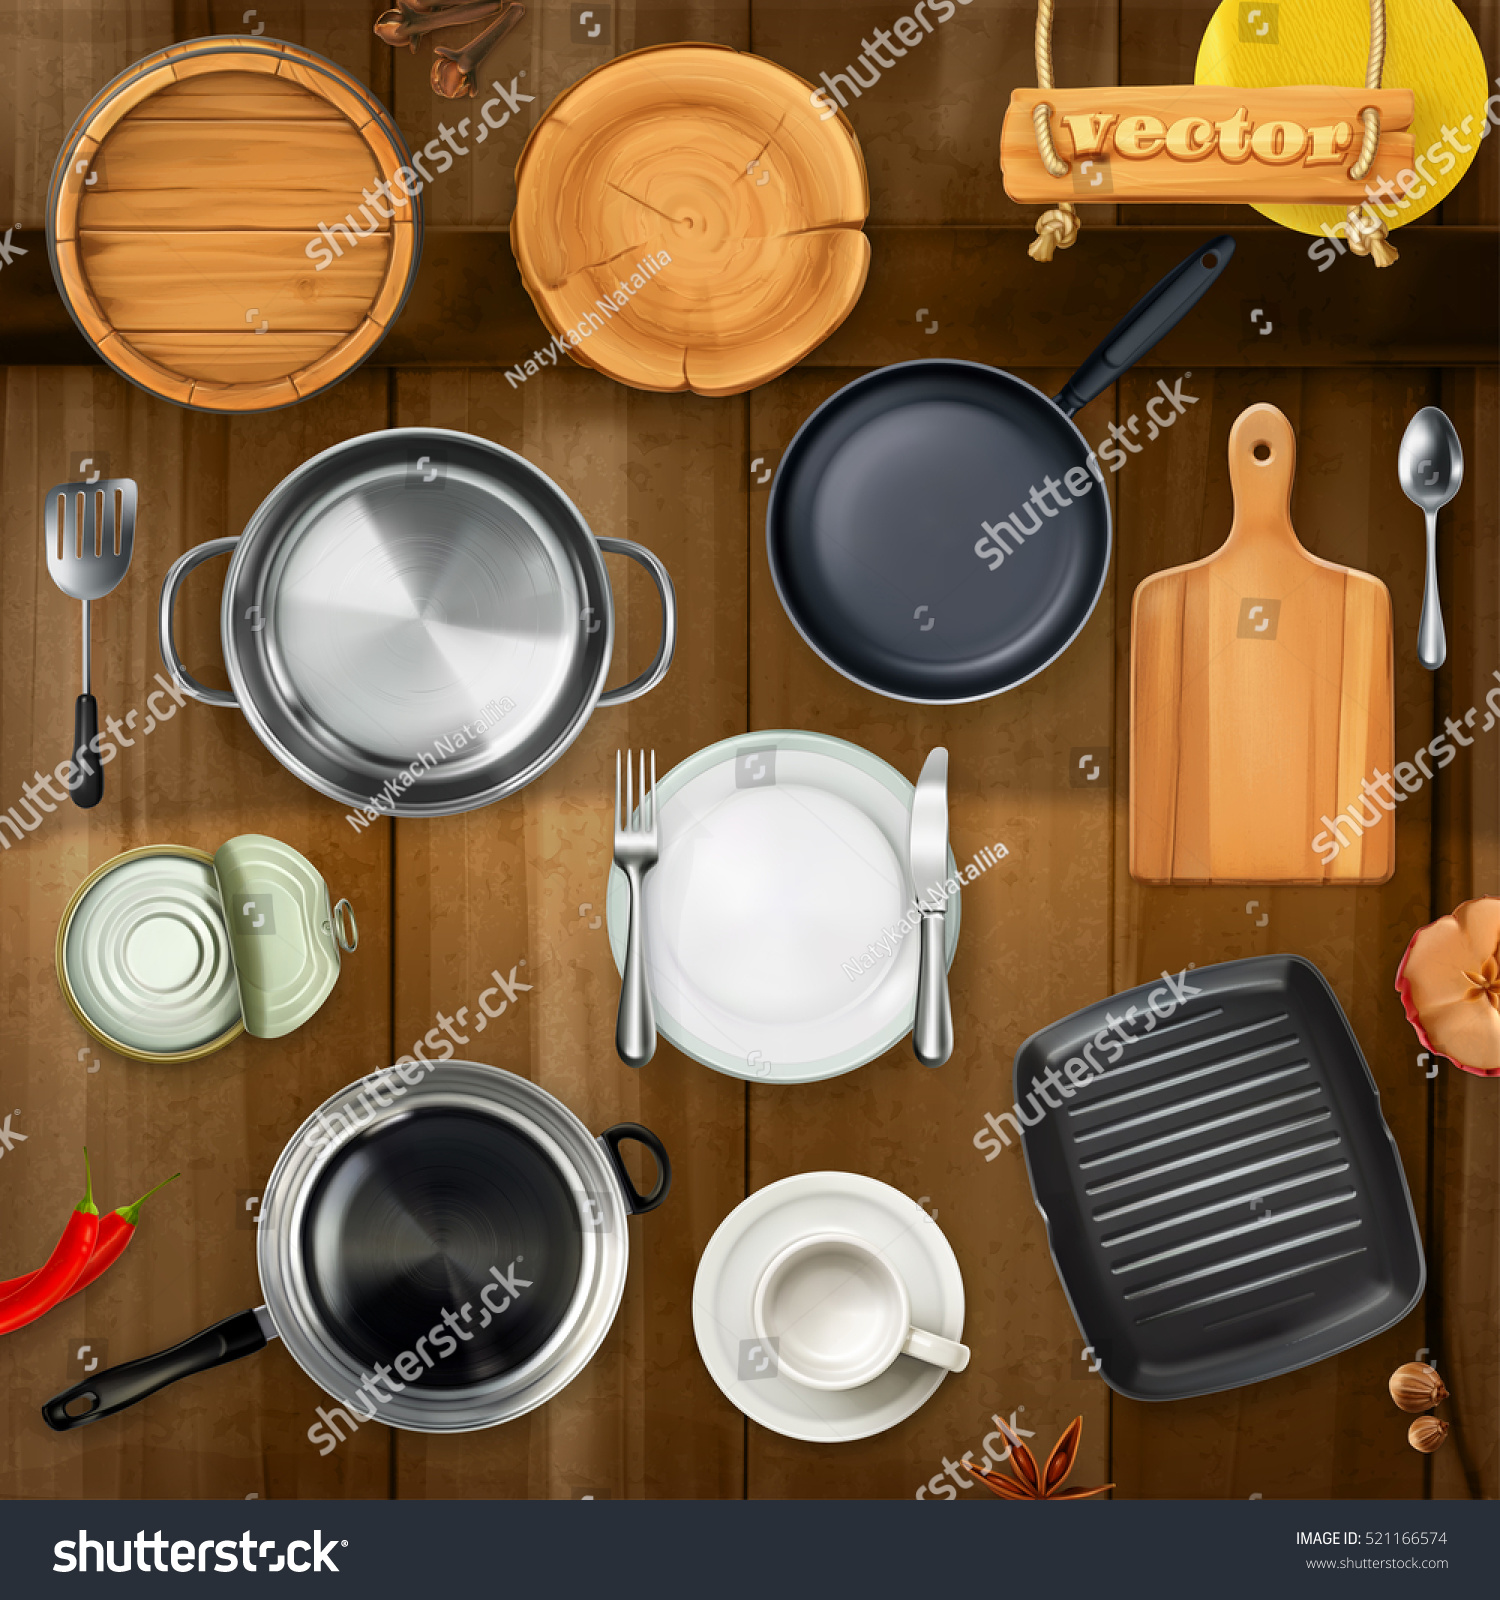 Kitchen Set Top View: Kitchen Utensils Pots Pans Plates Top Stock Vector